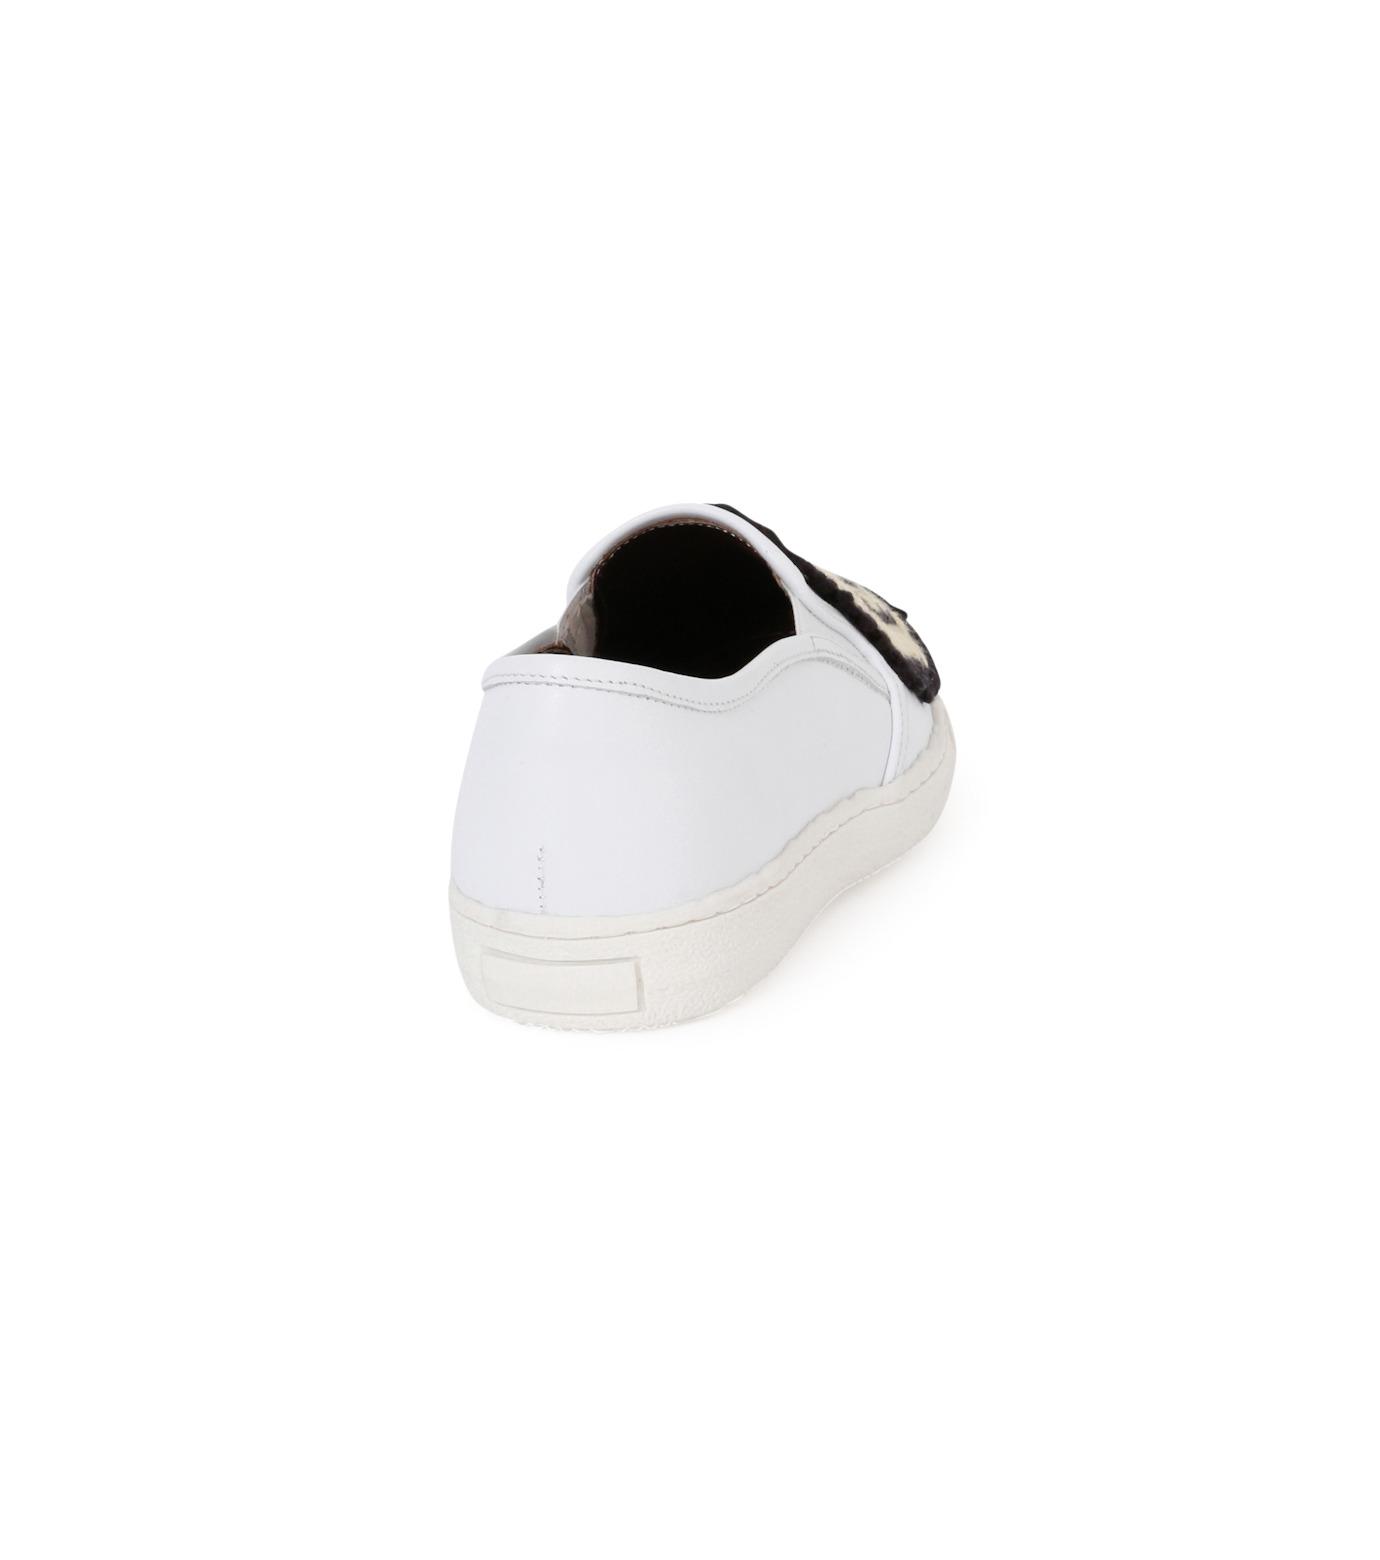 Michaela Buerger(ミカエラ バーガー)のSneaker Bye Bye-WHITE(スニーカー/sneaker)-BYEBYE-4 拡大詳細画像3